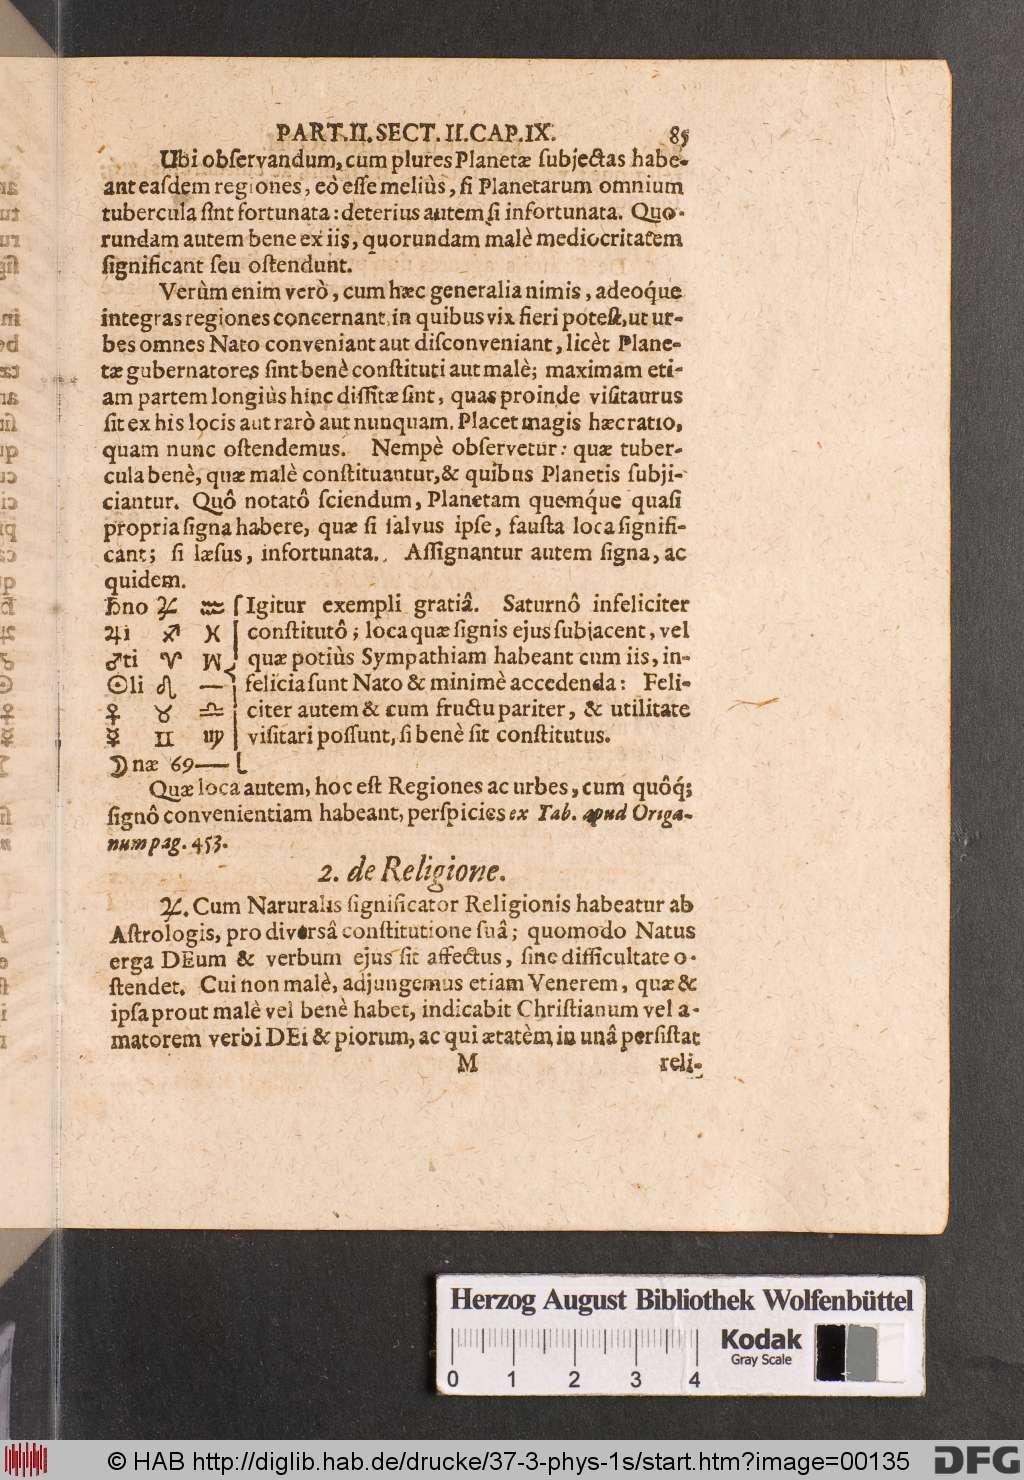 http://diglib.hab.de/drucke/37-3-phys-1s/00135.jpg